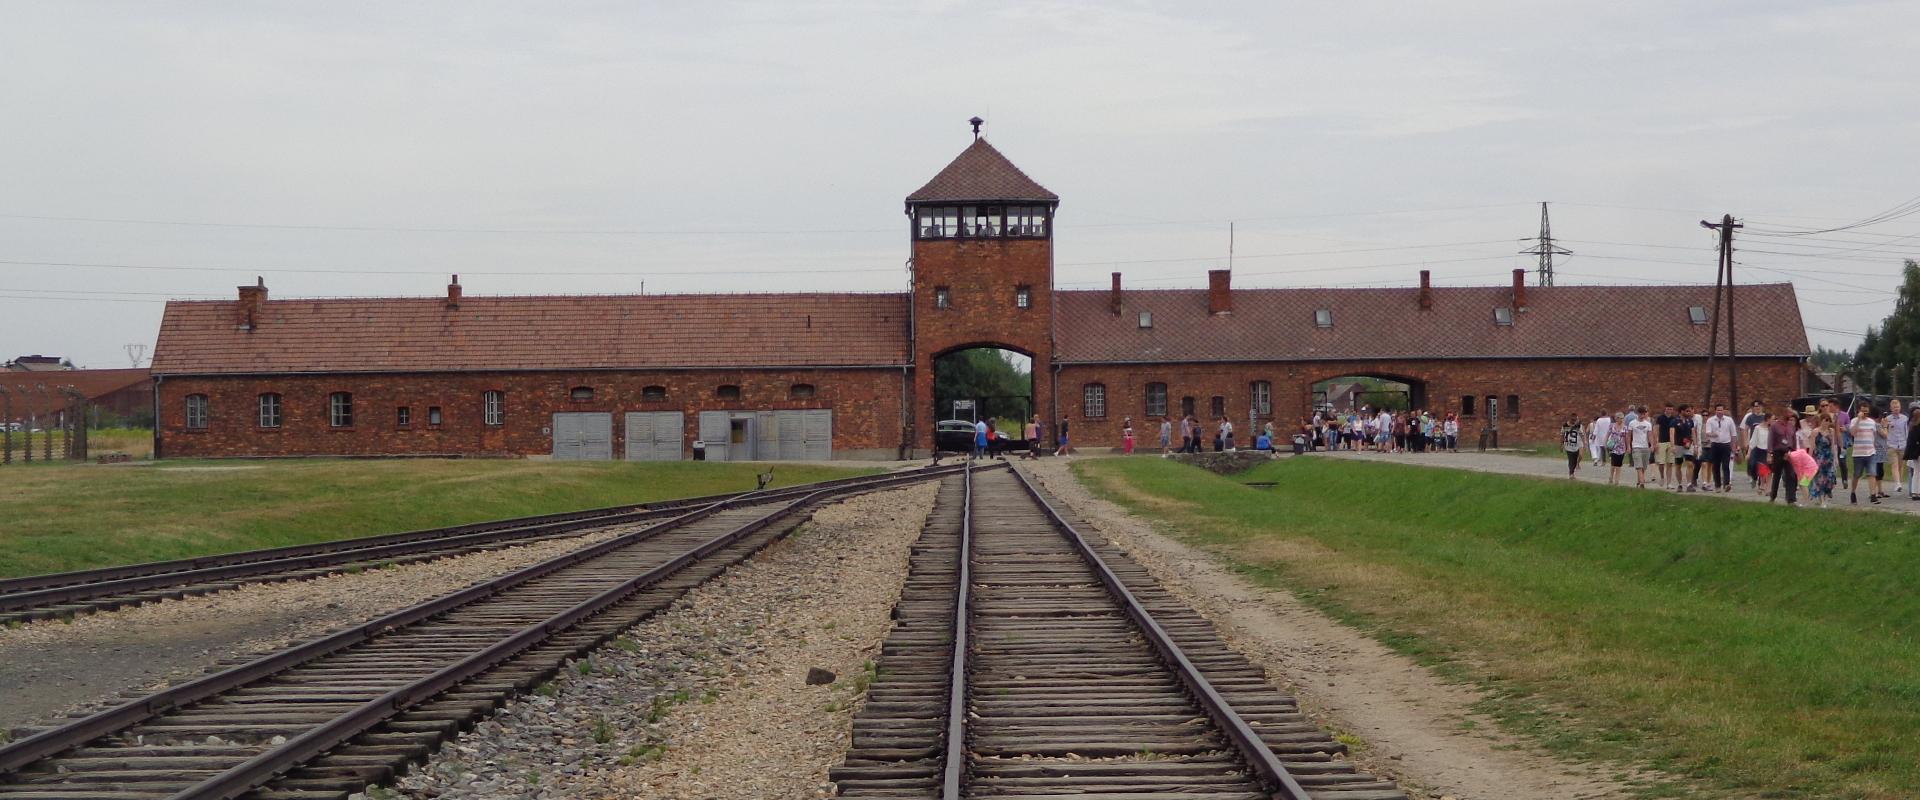 Foto: Auschwitz - da Wikipedia